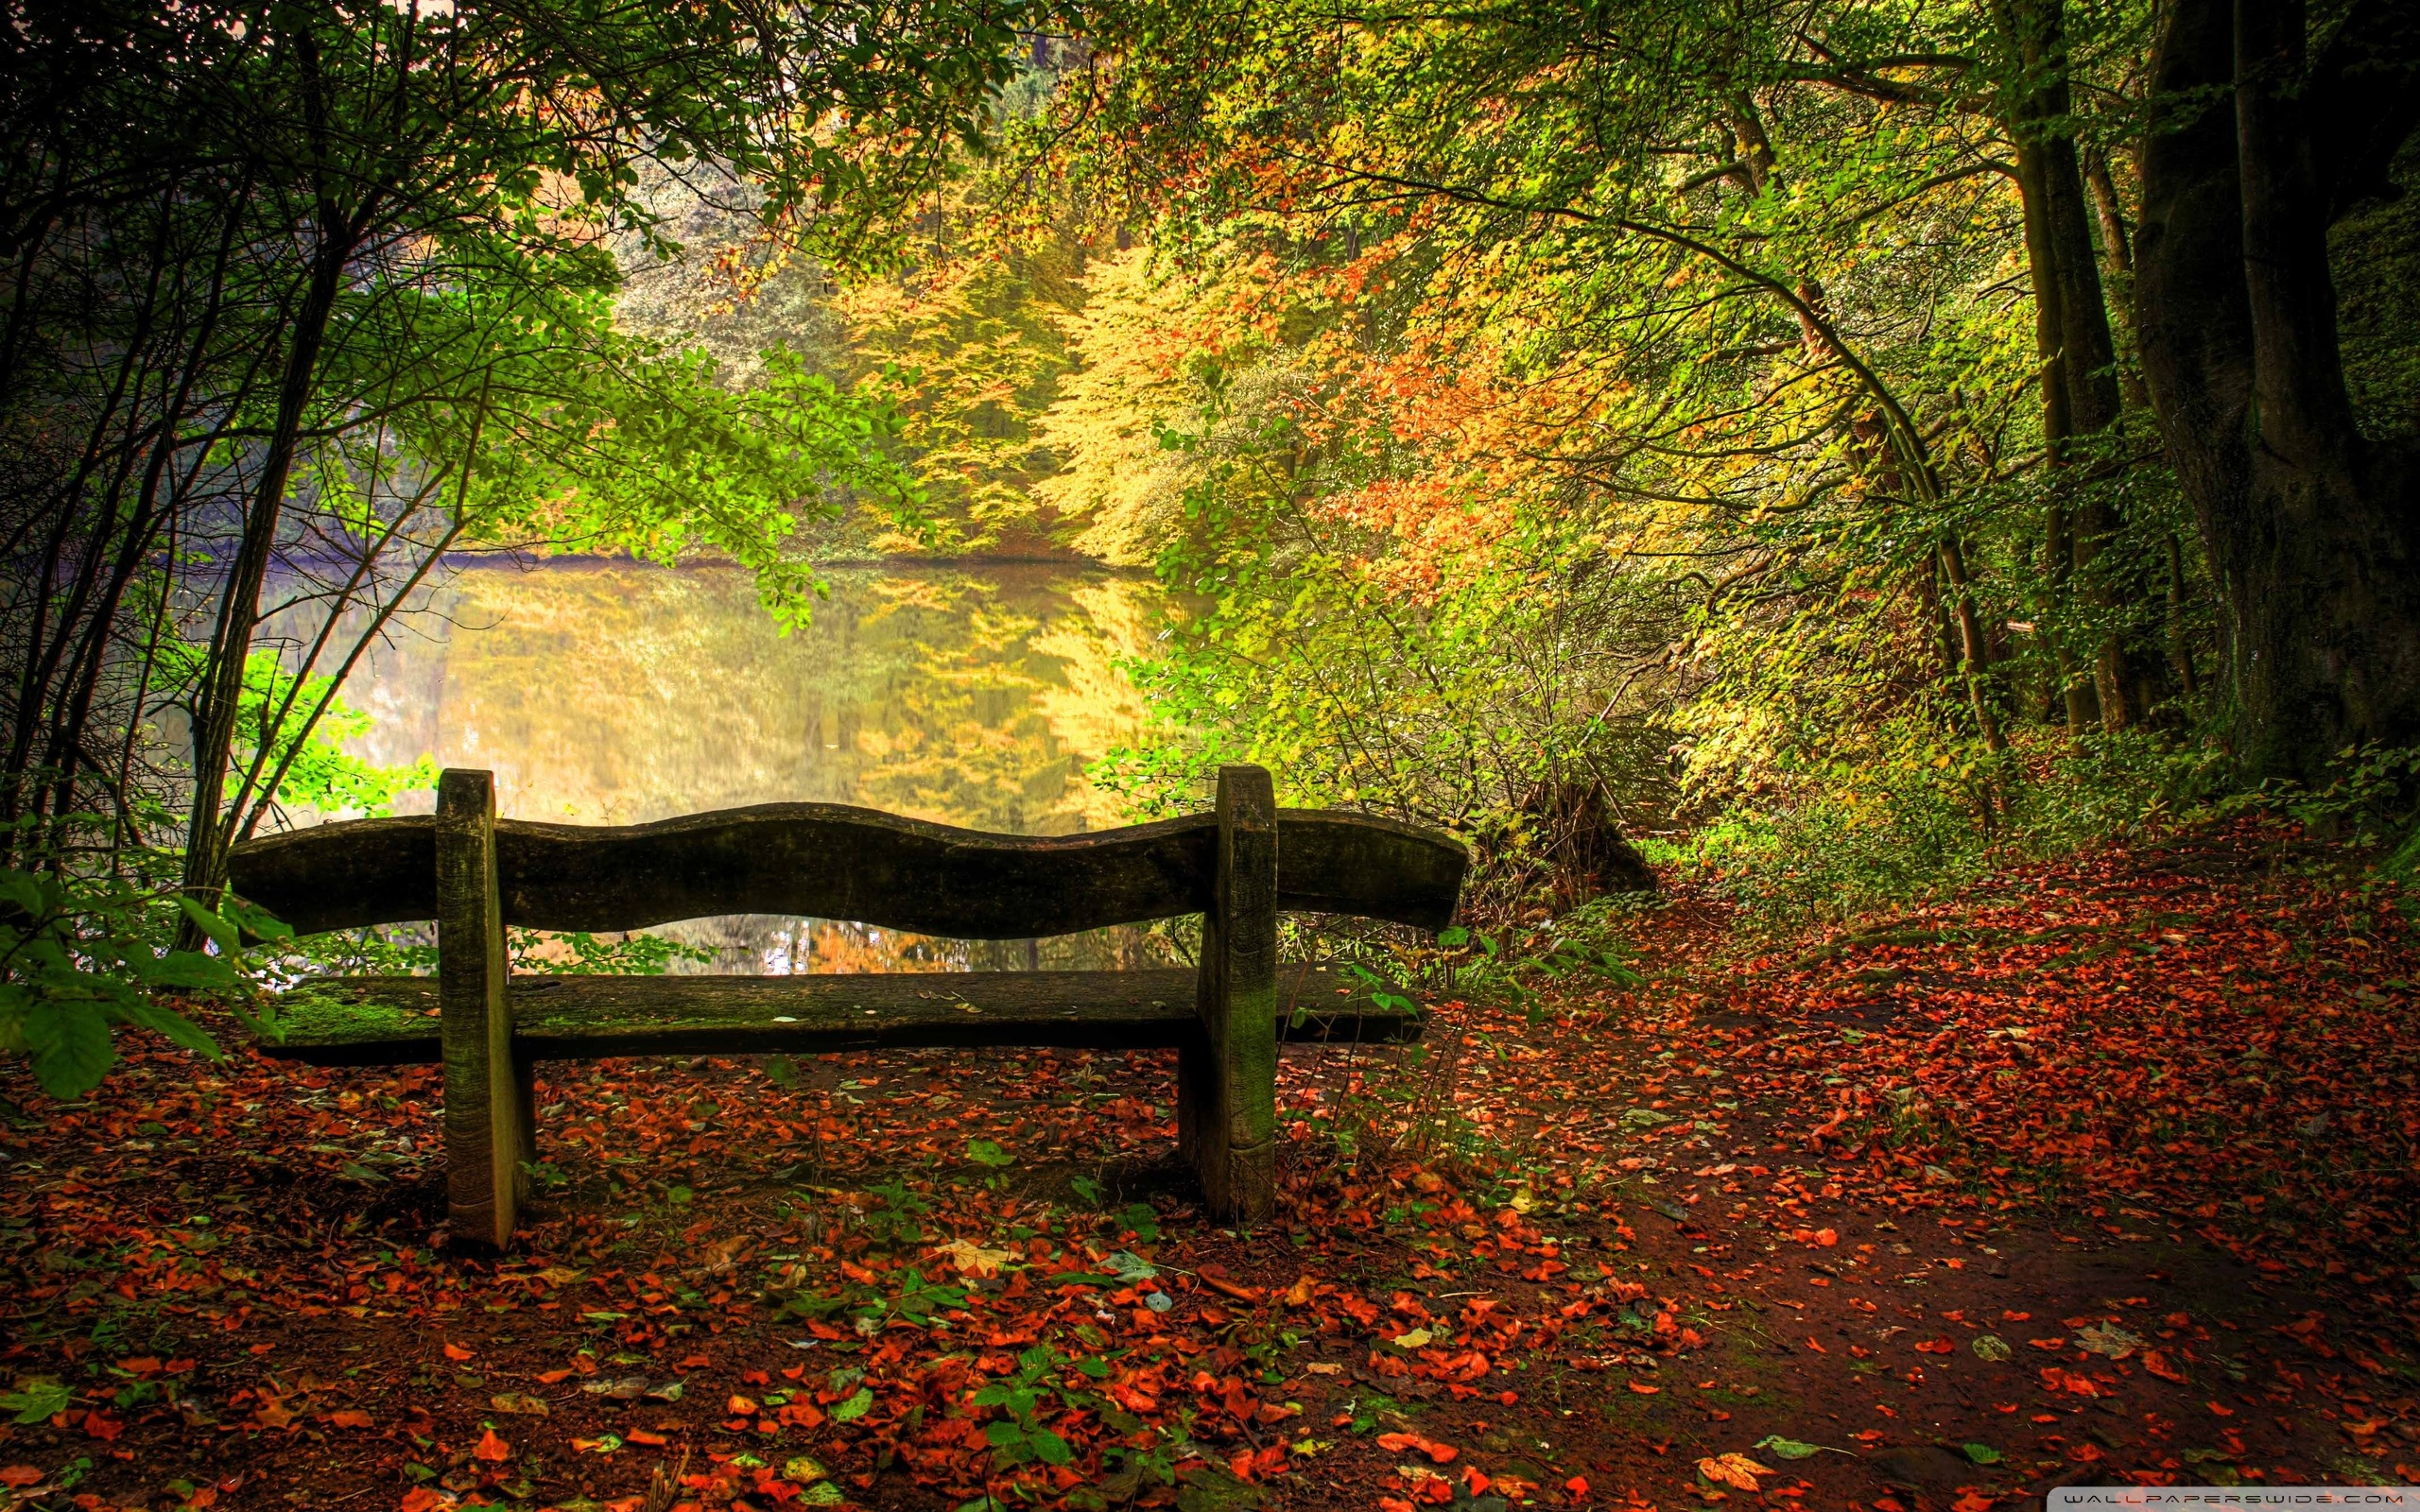 mi9comautumn free wallpaper empty bench in fall scene 93152html 2560x1600